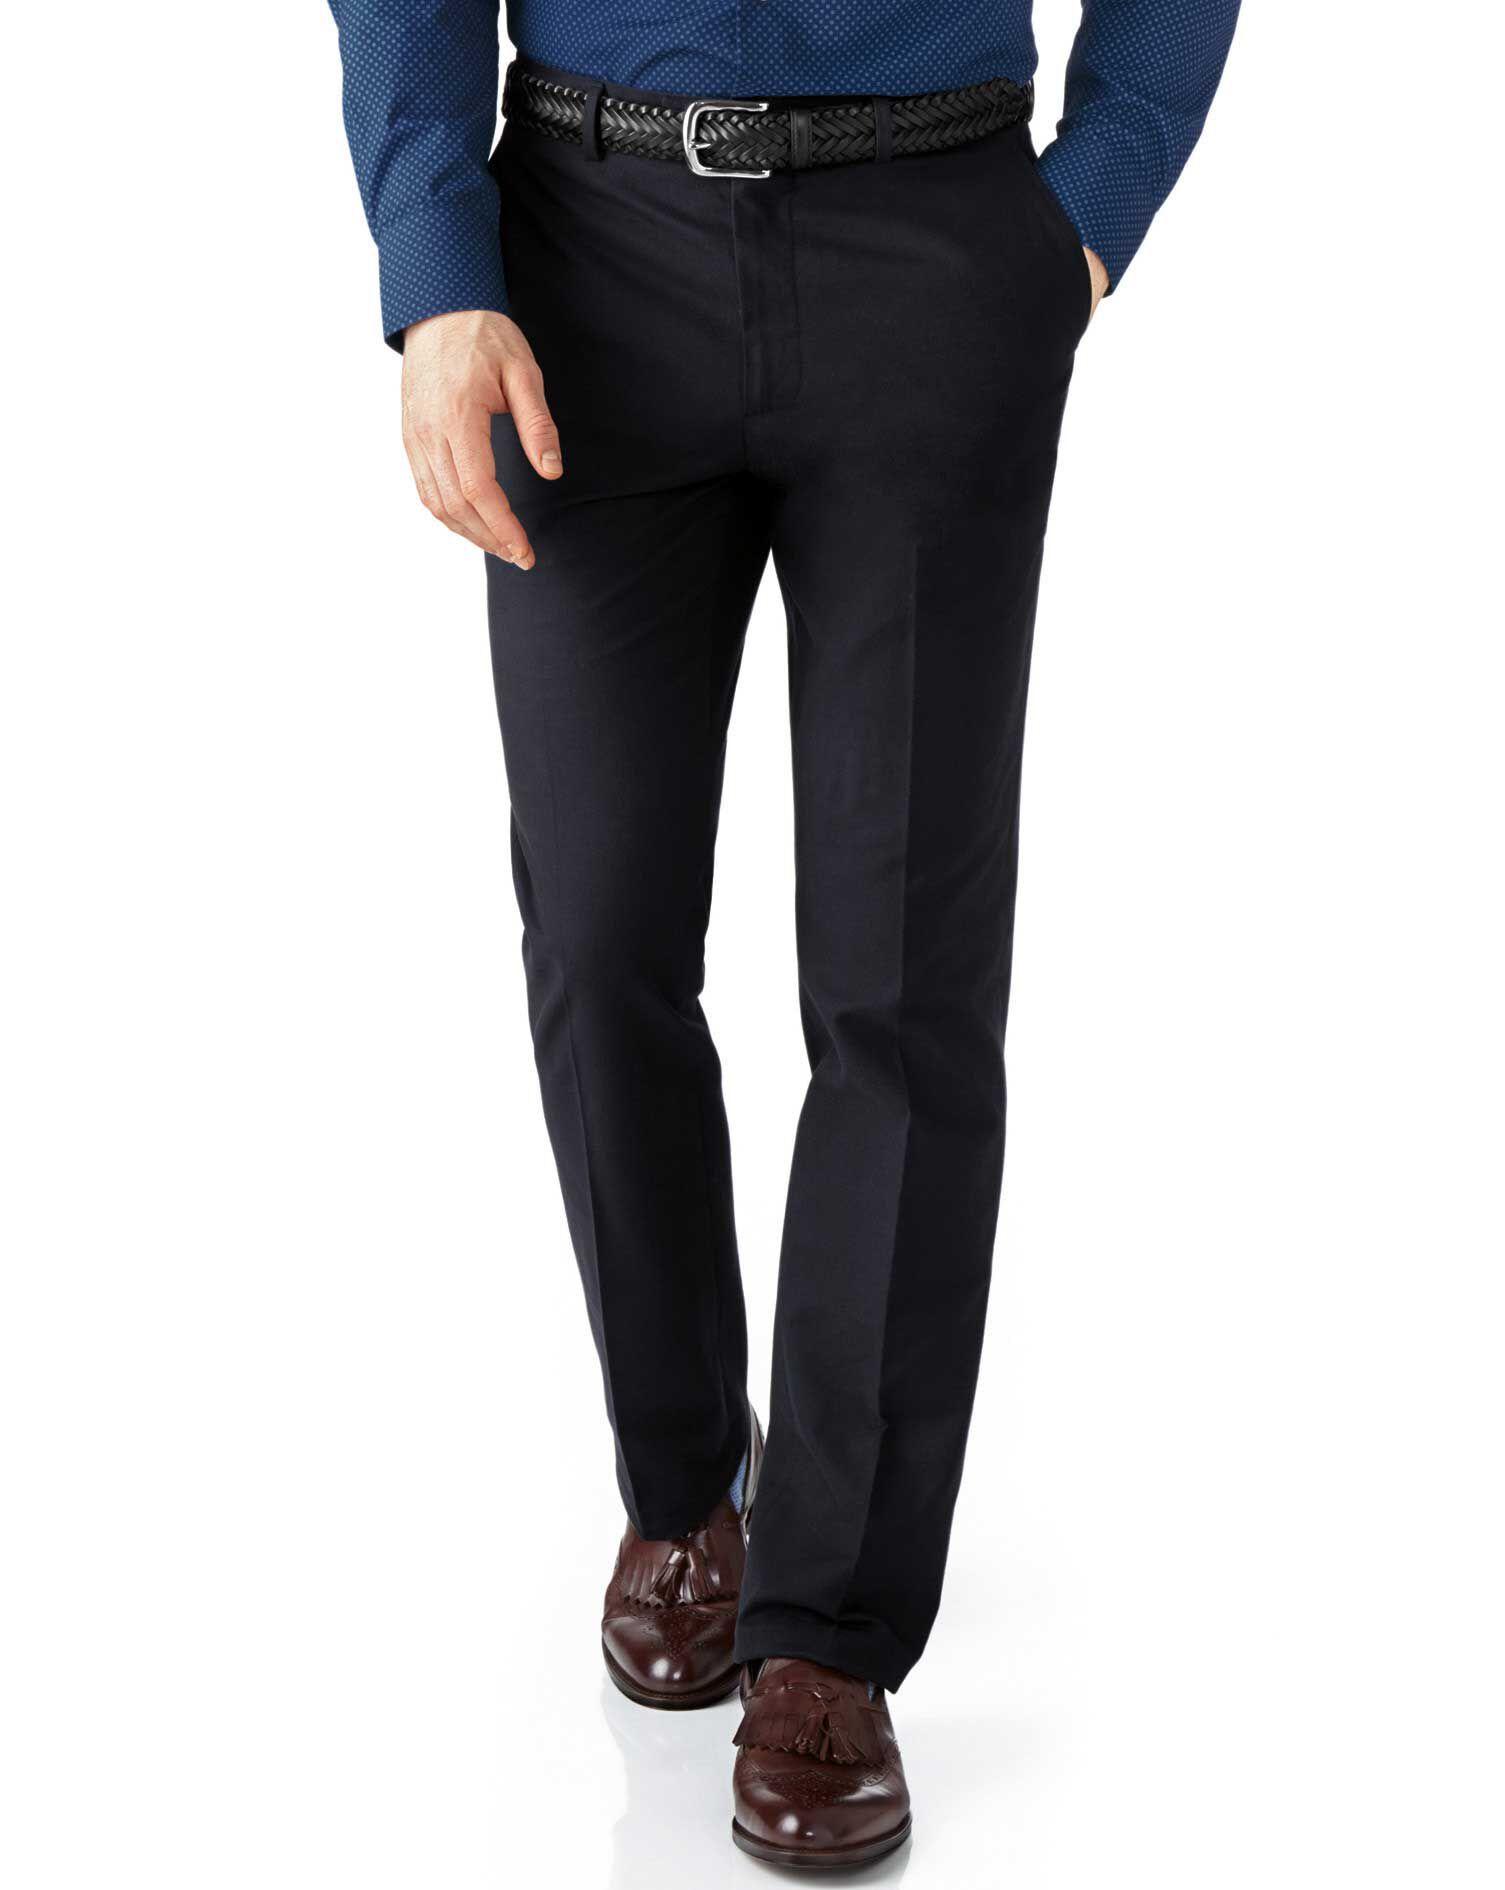 Dark Navy Slim Fit Cotton Flannel Trouser Size W38 L34 by Charles Tyrwhitt